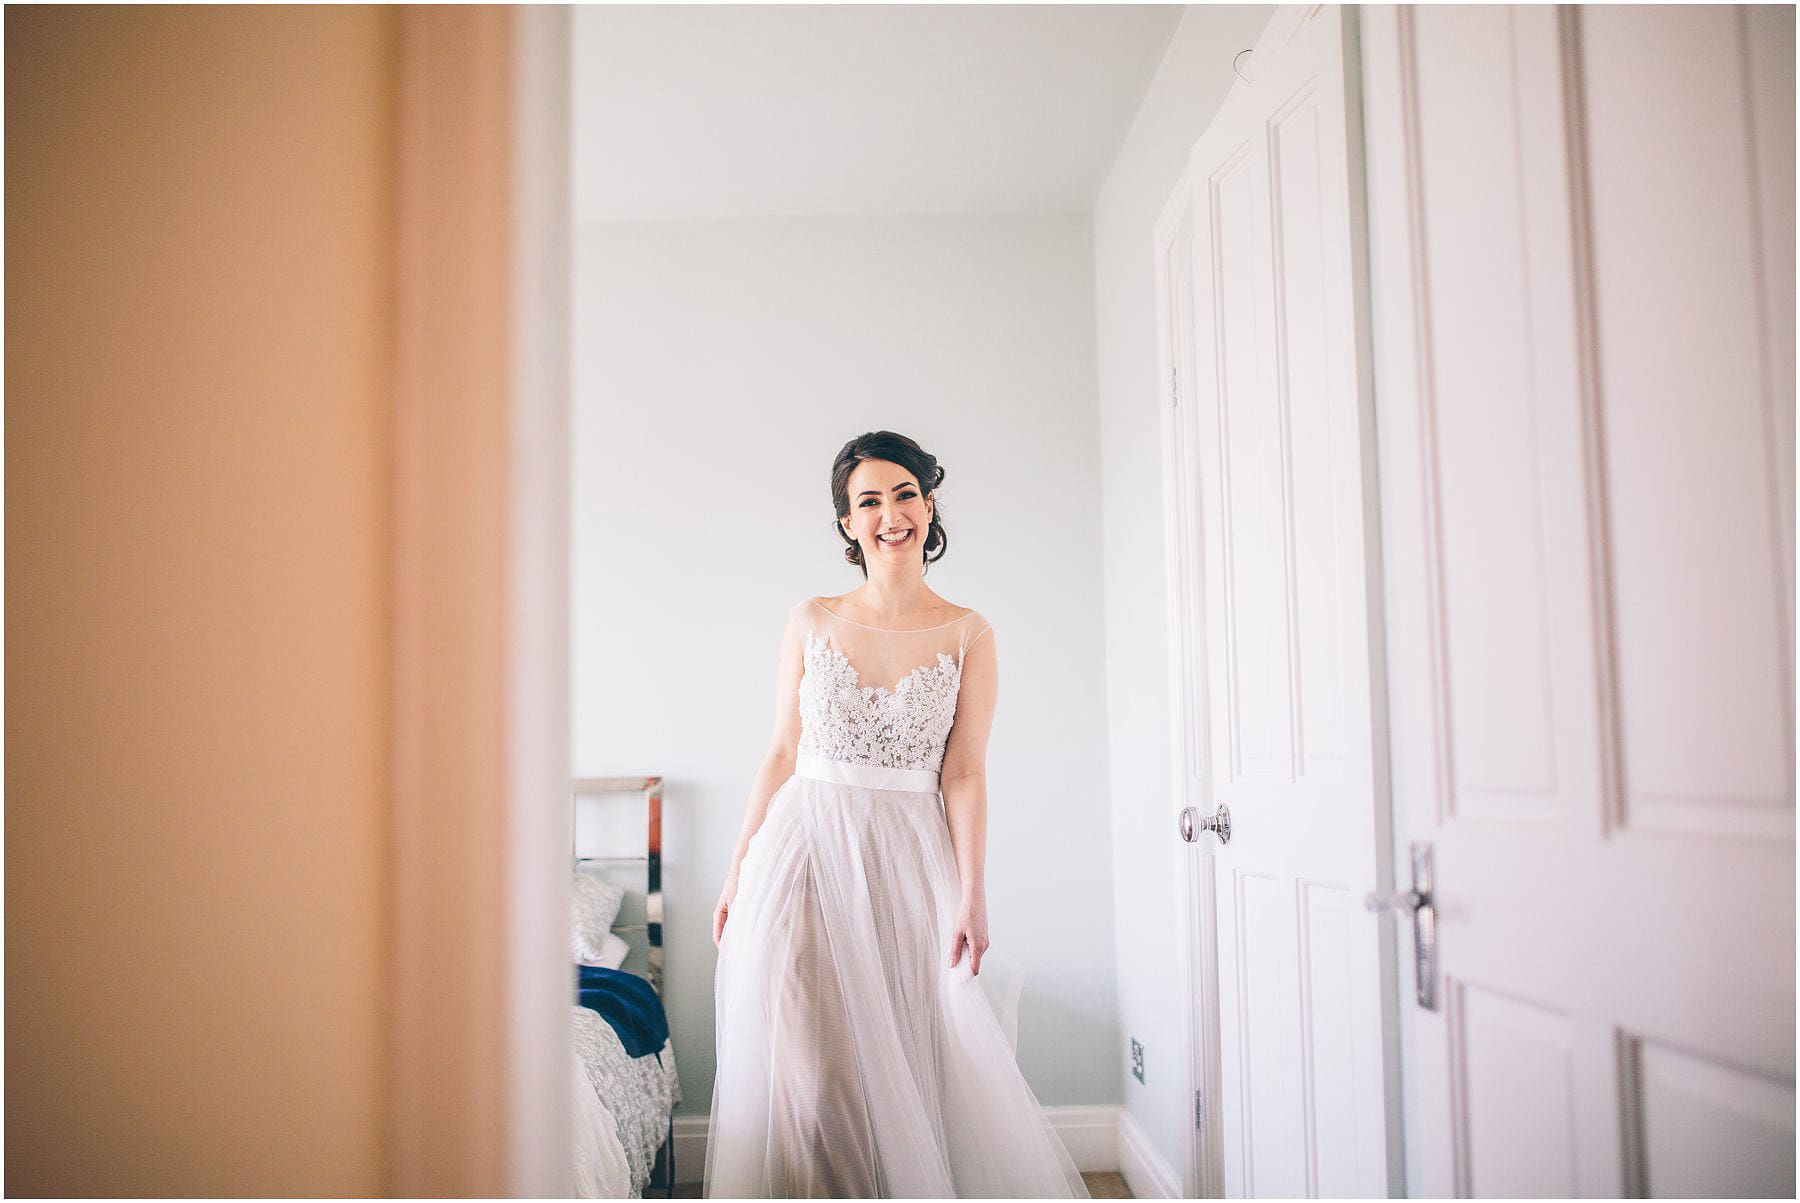 Bowdon_Rooms_Wedding_Photography_0027